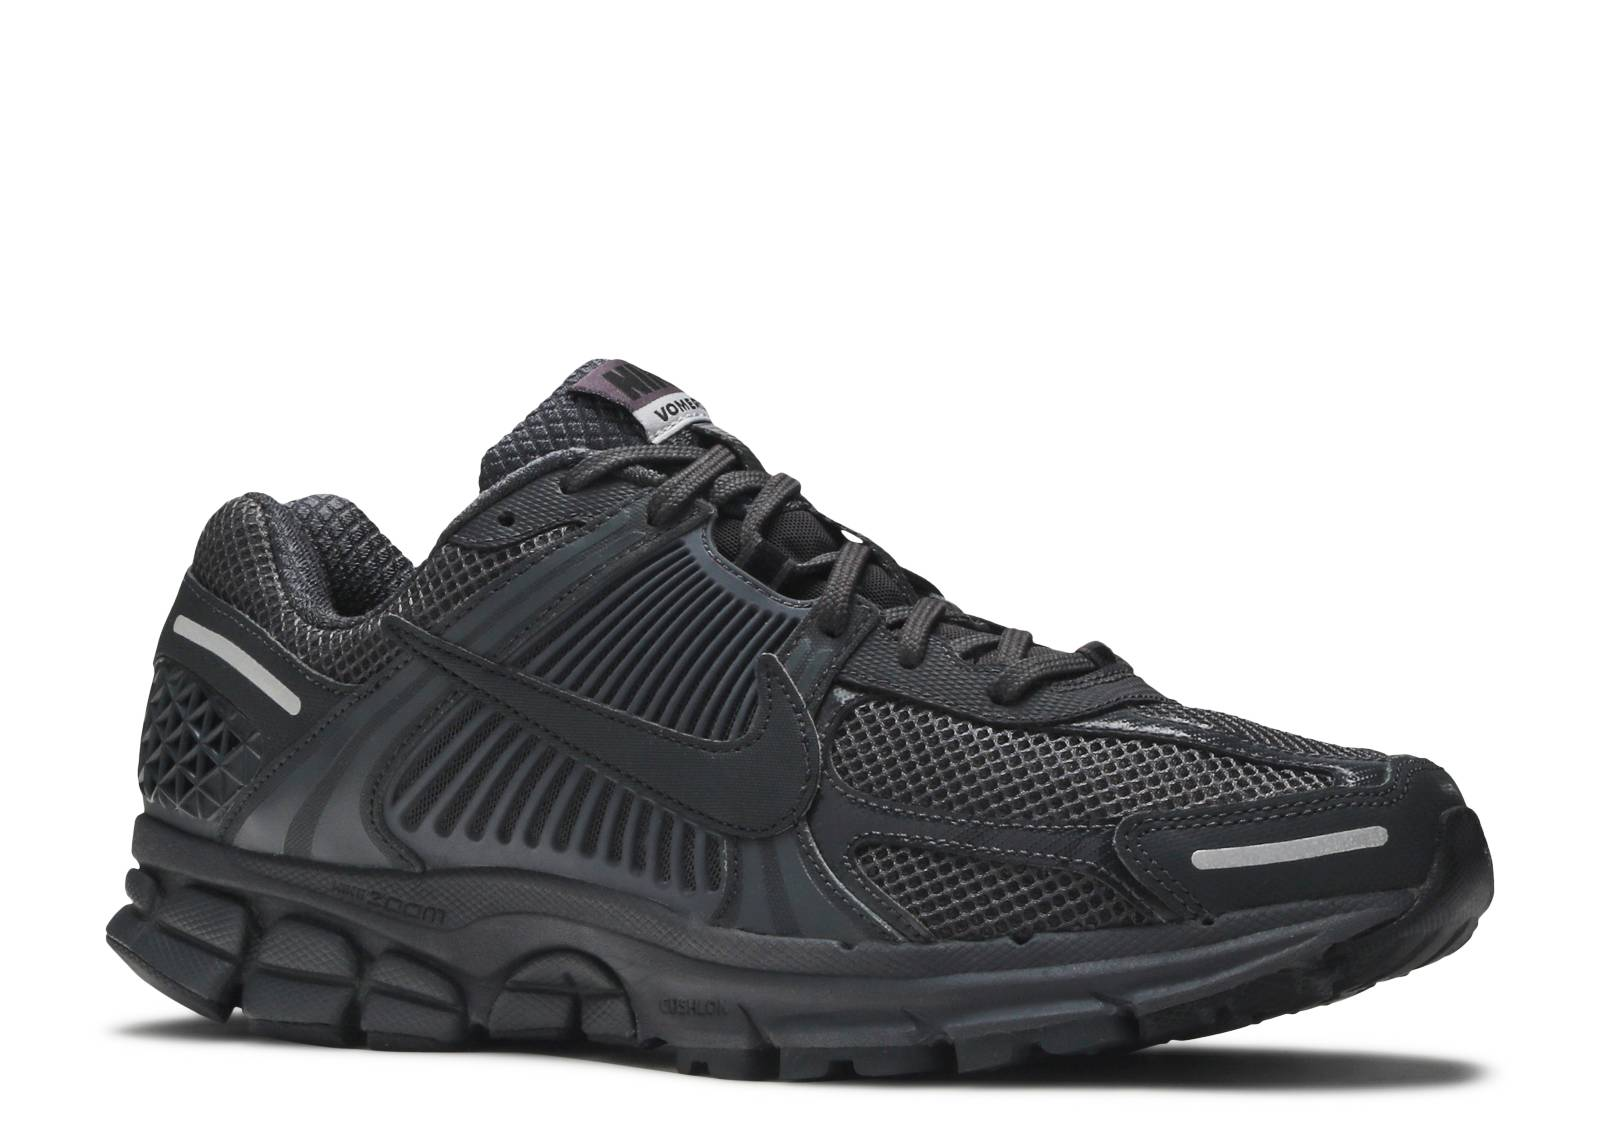 pretty nice d8512 b7cd4 Nike Zoom Vomero 5 Sp - Nike - bv1358 002 - anthracite anthracite-black    Flight Club